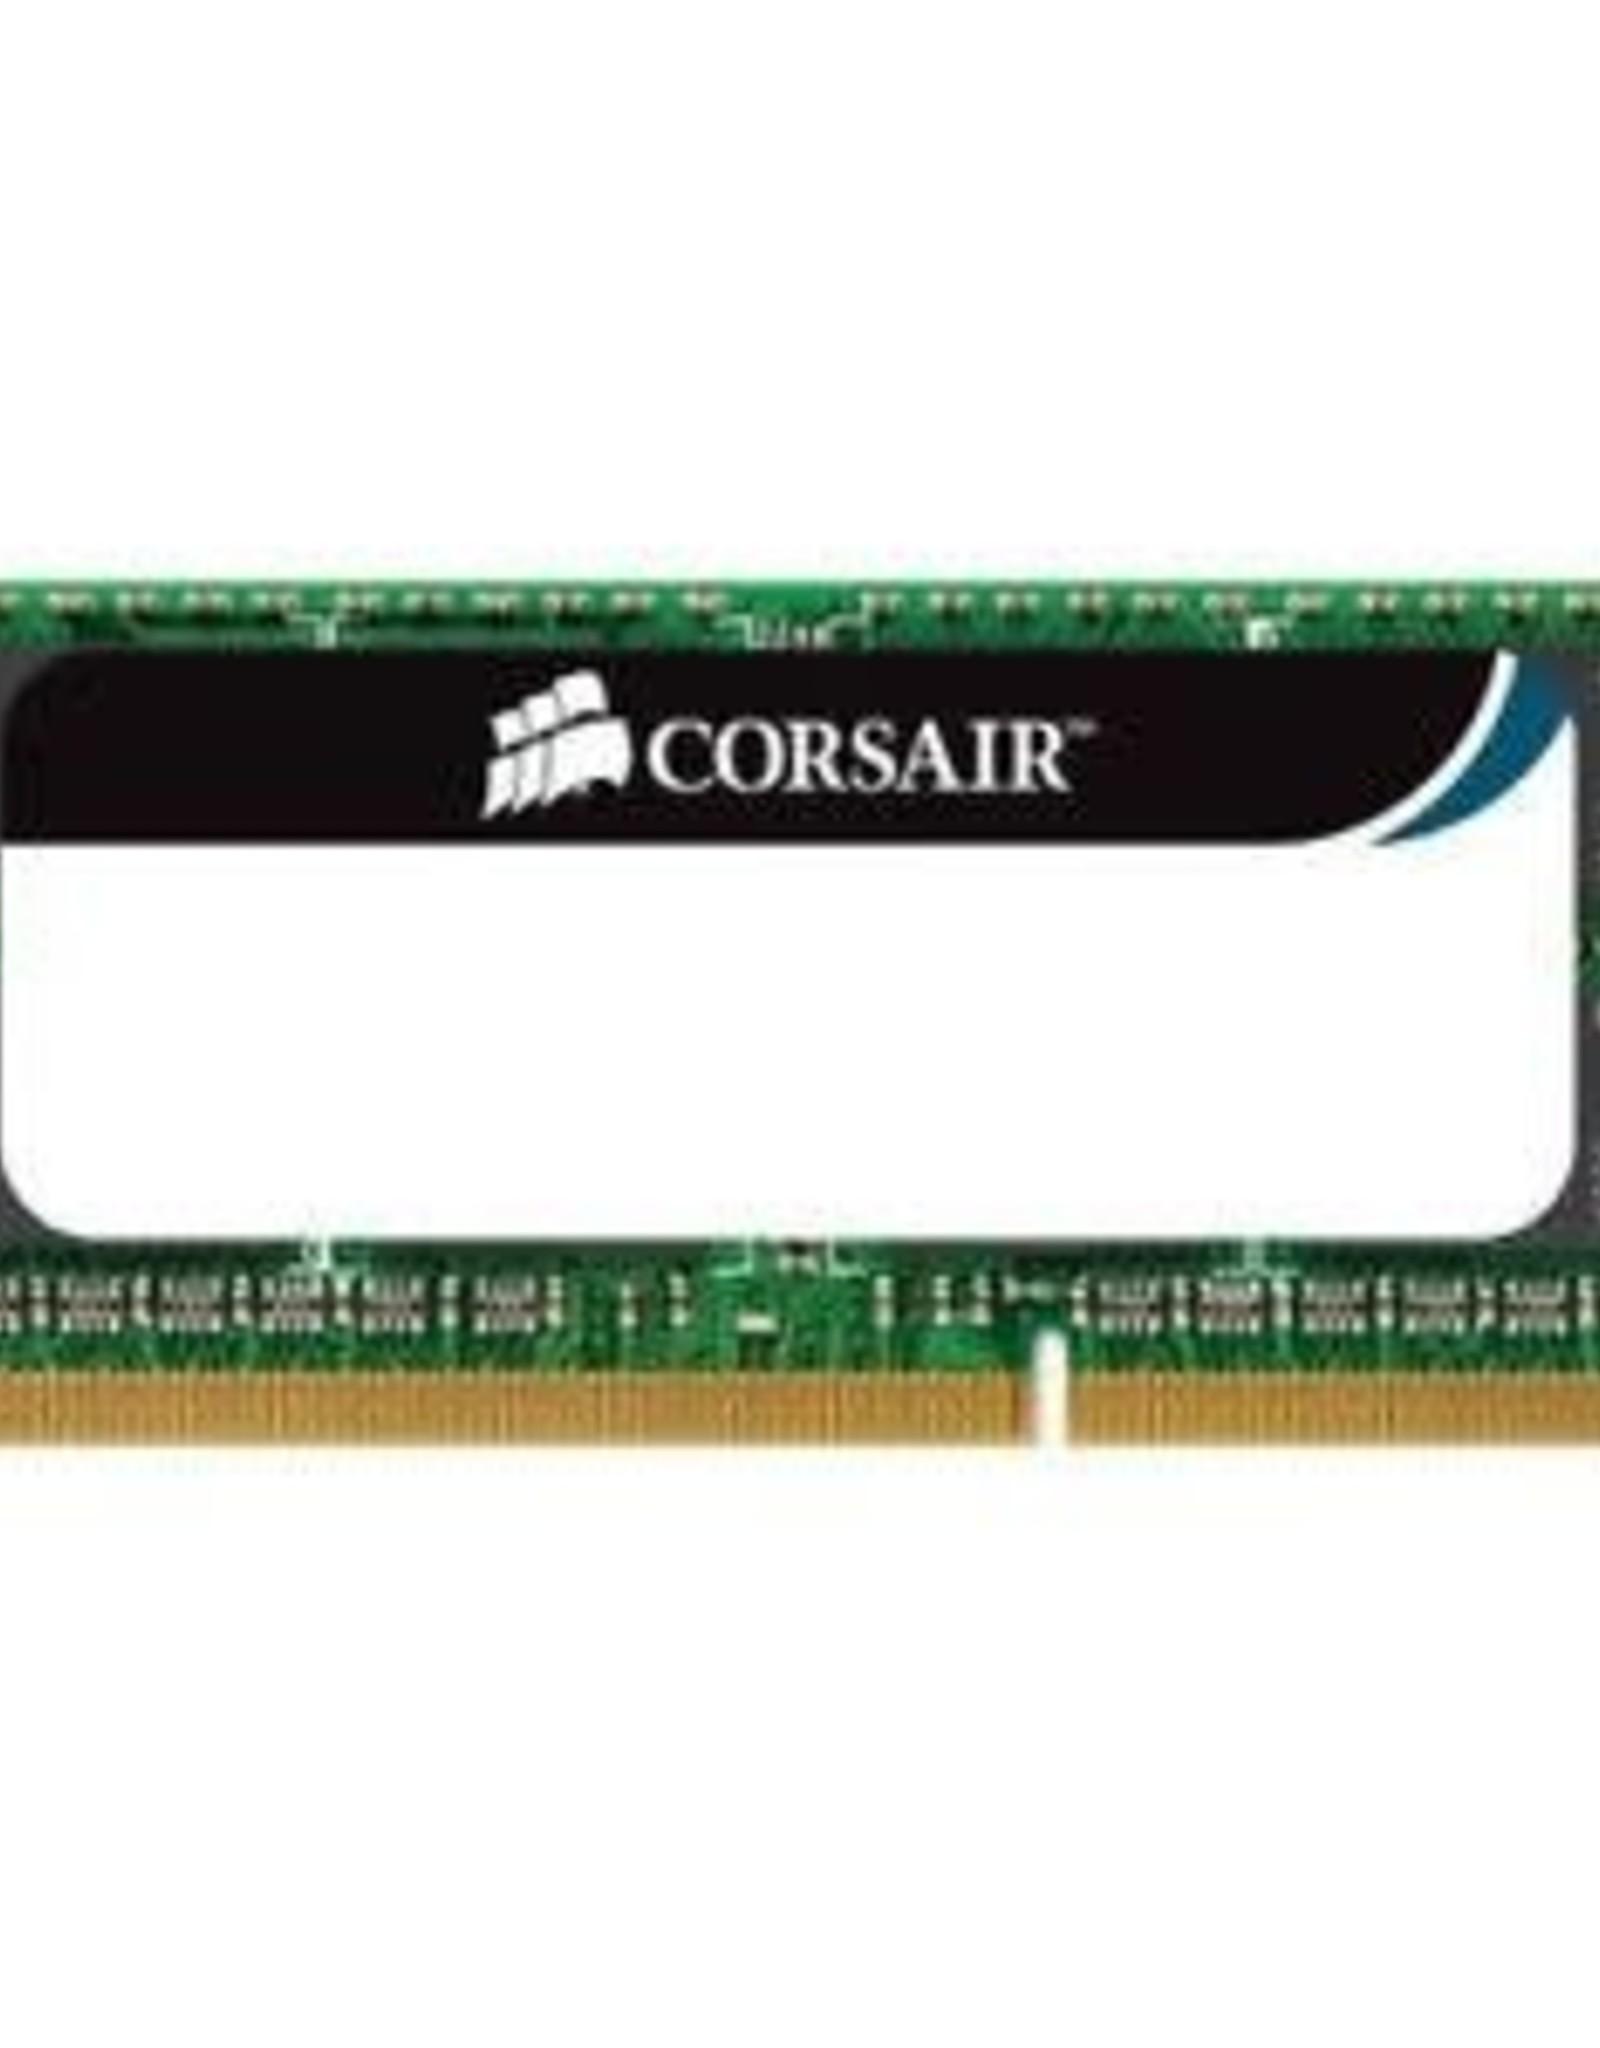 Corsair Corsair 4GB DDR3 SoDIMM - CMSO4GX3M1A1333C9